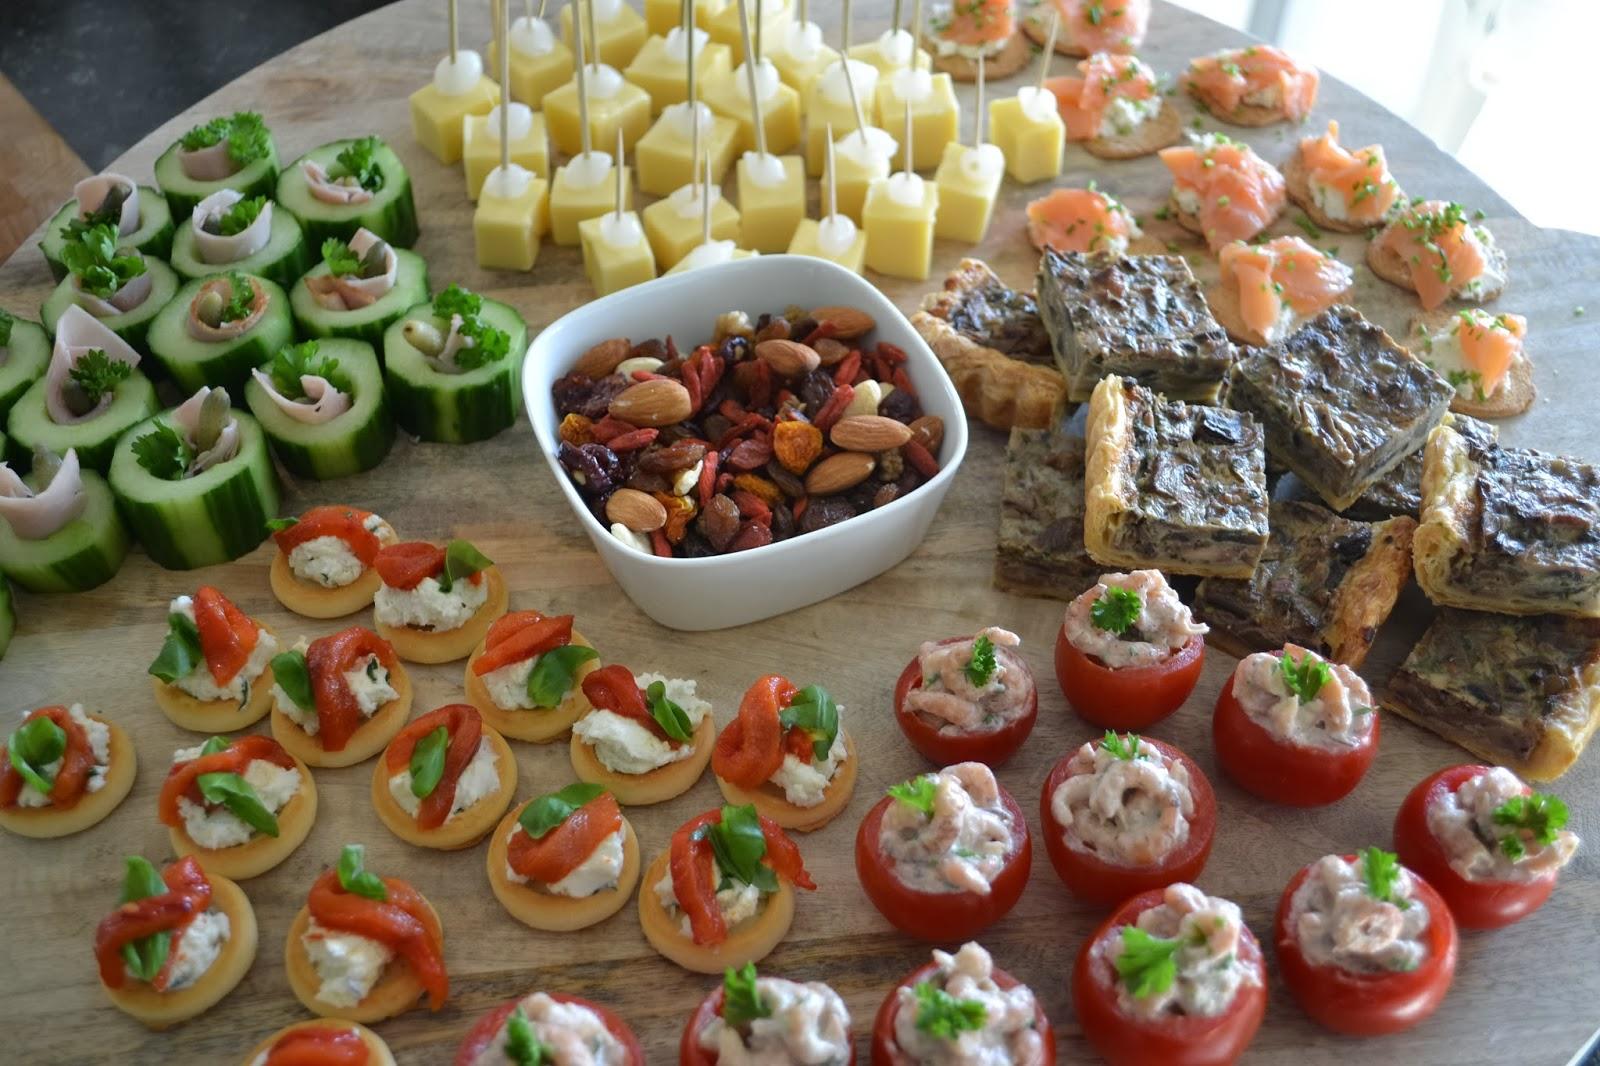 Bekend Eet lekker: Gevulde tomaatjes met Hollandse garnalen @MH94